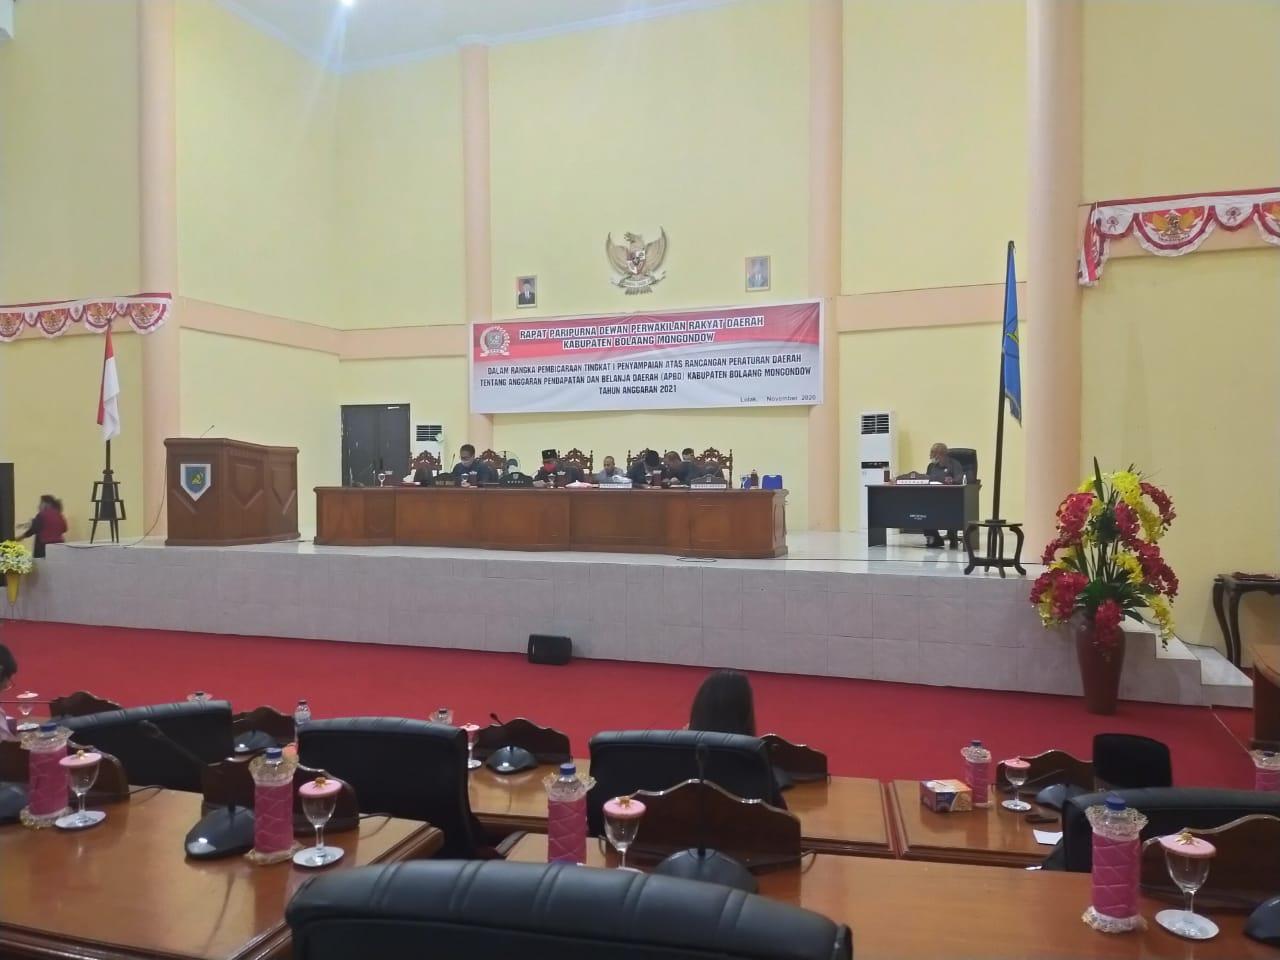 Pembahasan tingkat Satu Ranperda APBD Bolmong 2021 dipimpin langsung Ketua DPRD Welty Komaling.